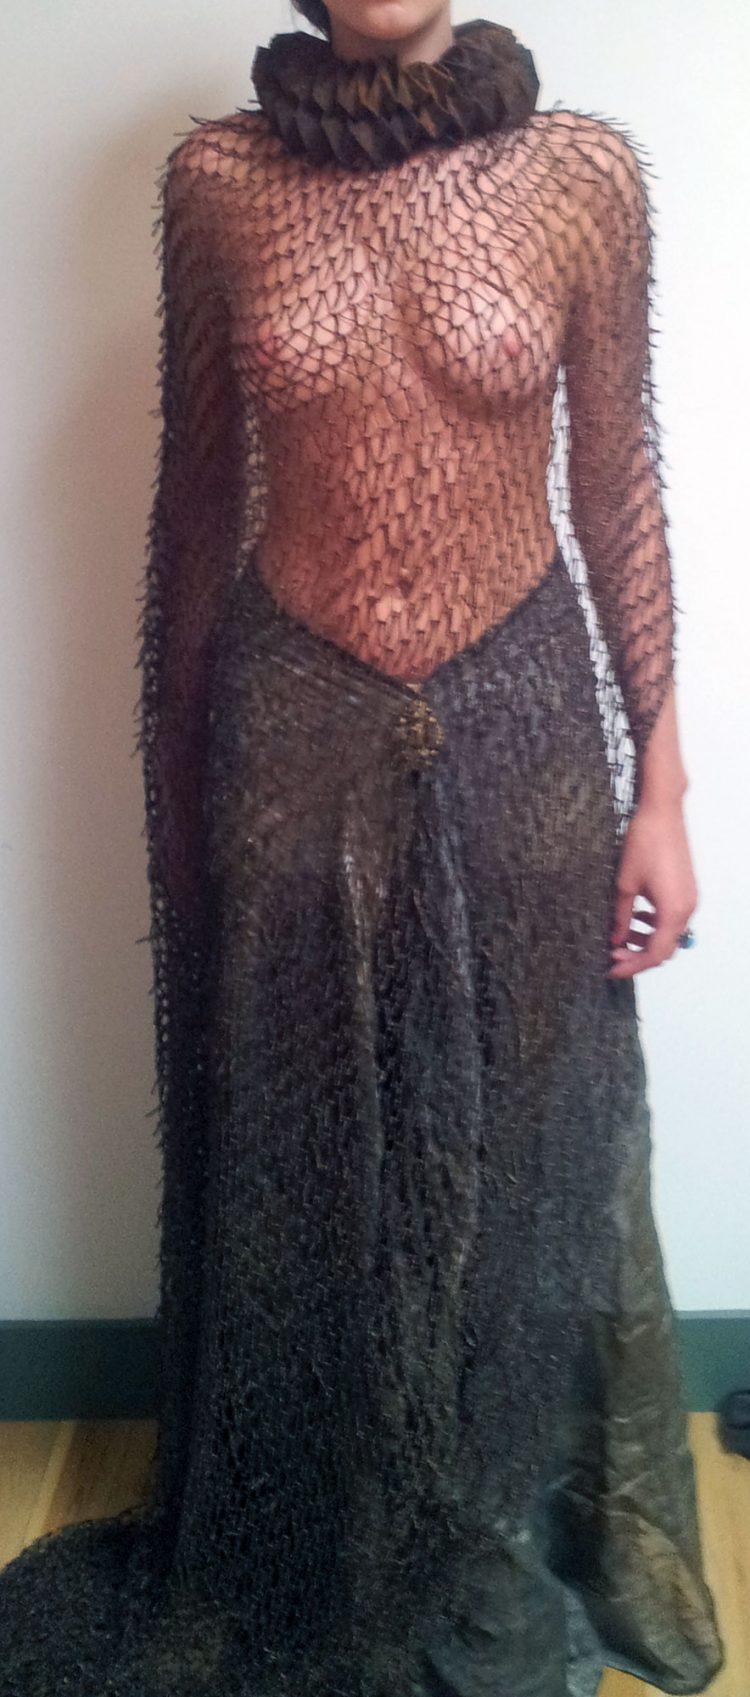 Game of Thrones costume textiles